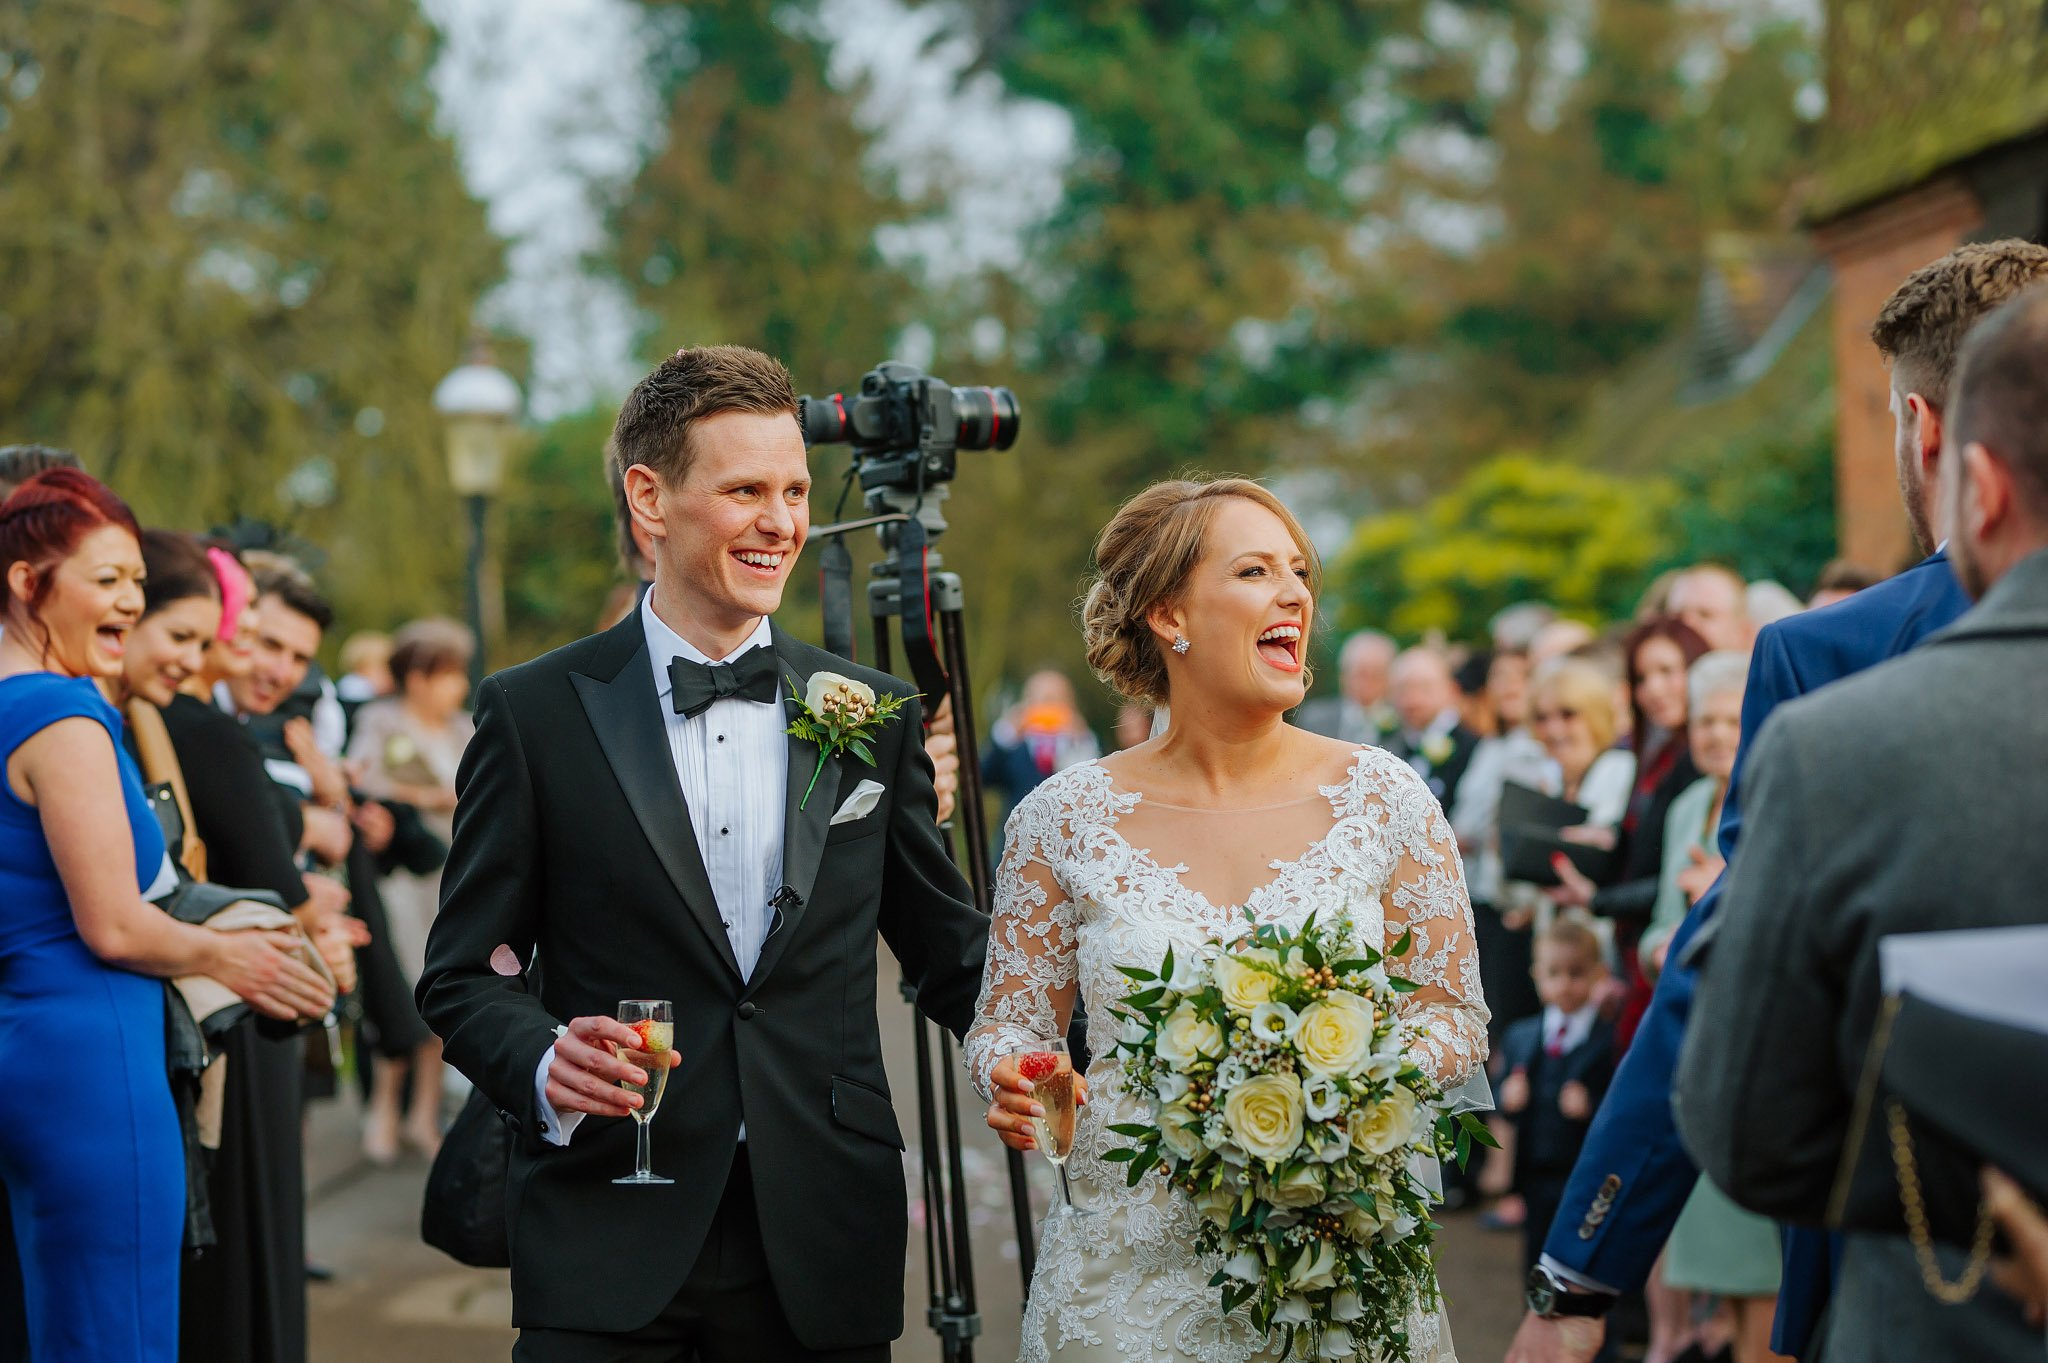 Coombe Abbey wedding in Coventry, Warwickshire - Sam + Matt 24